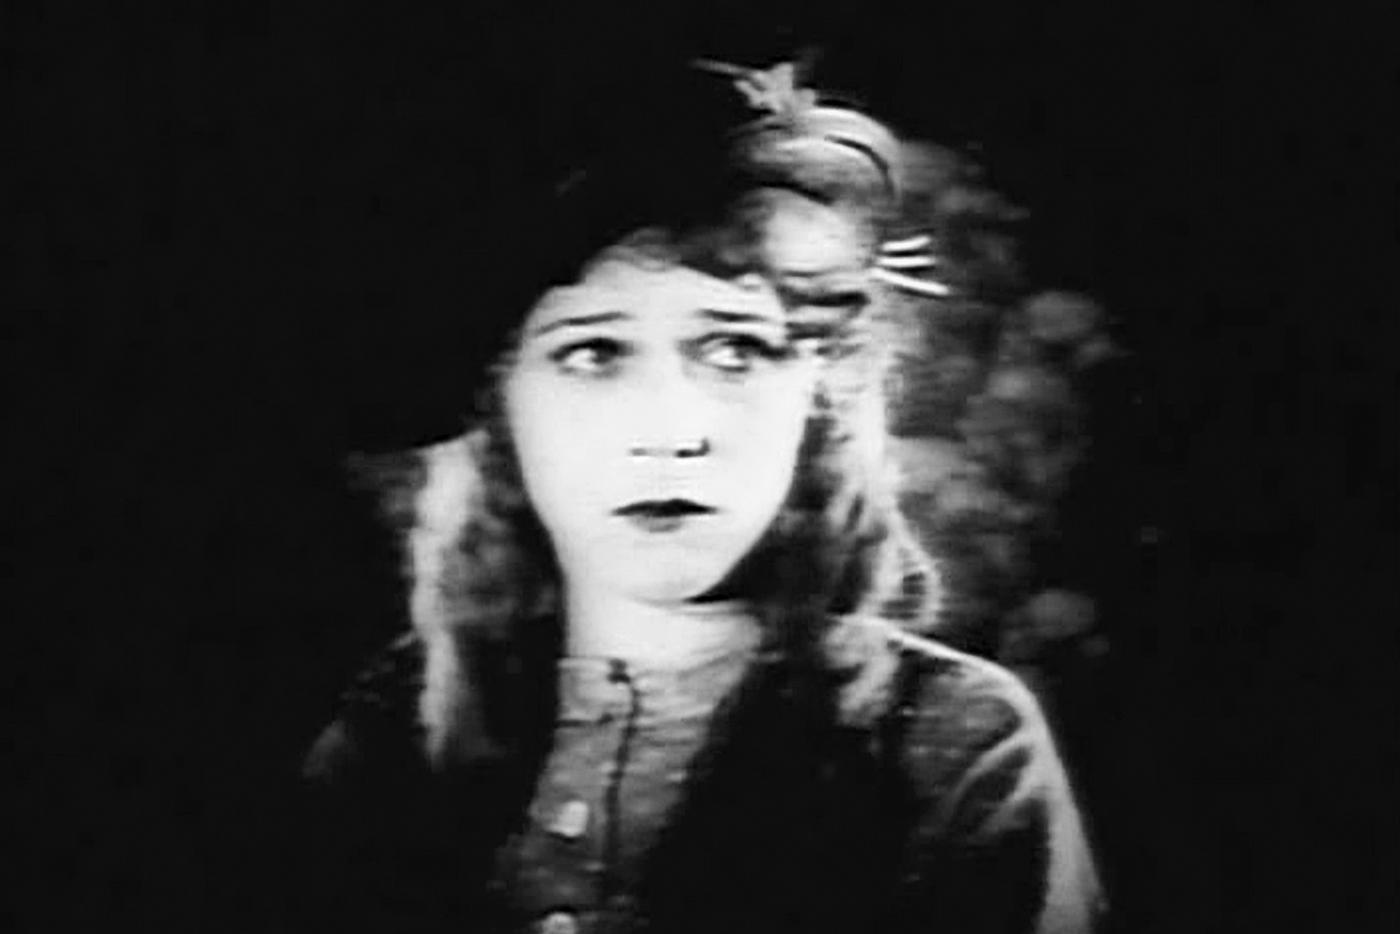 pics Peter Finch (1916?977)